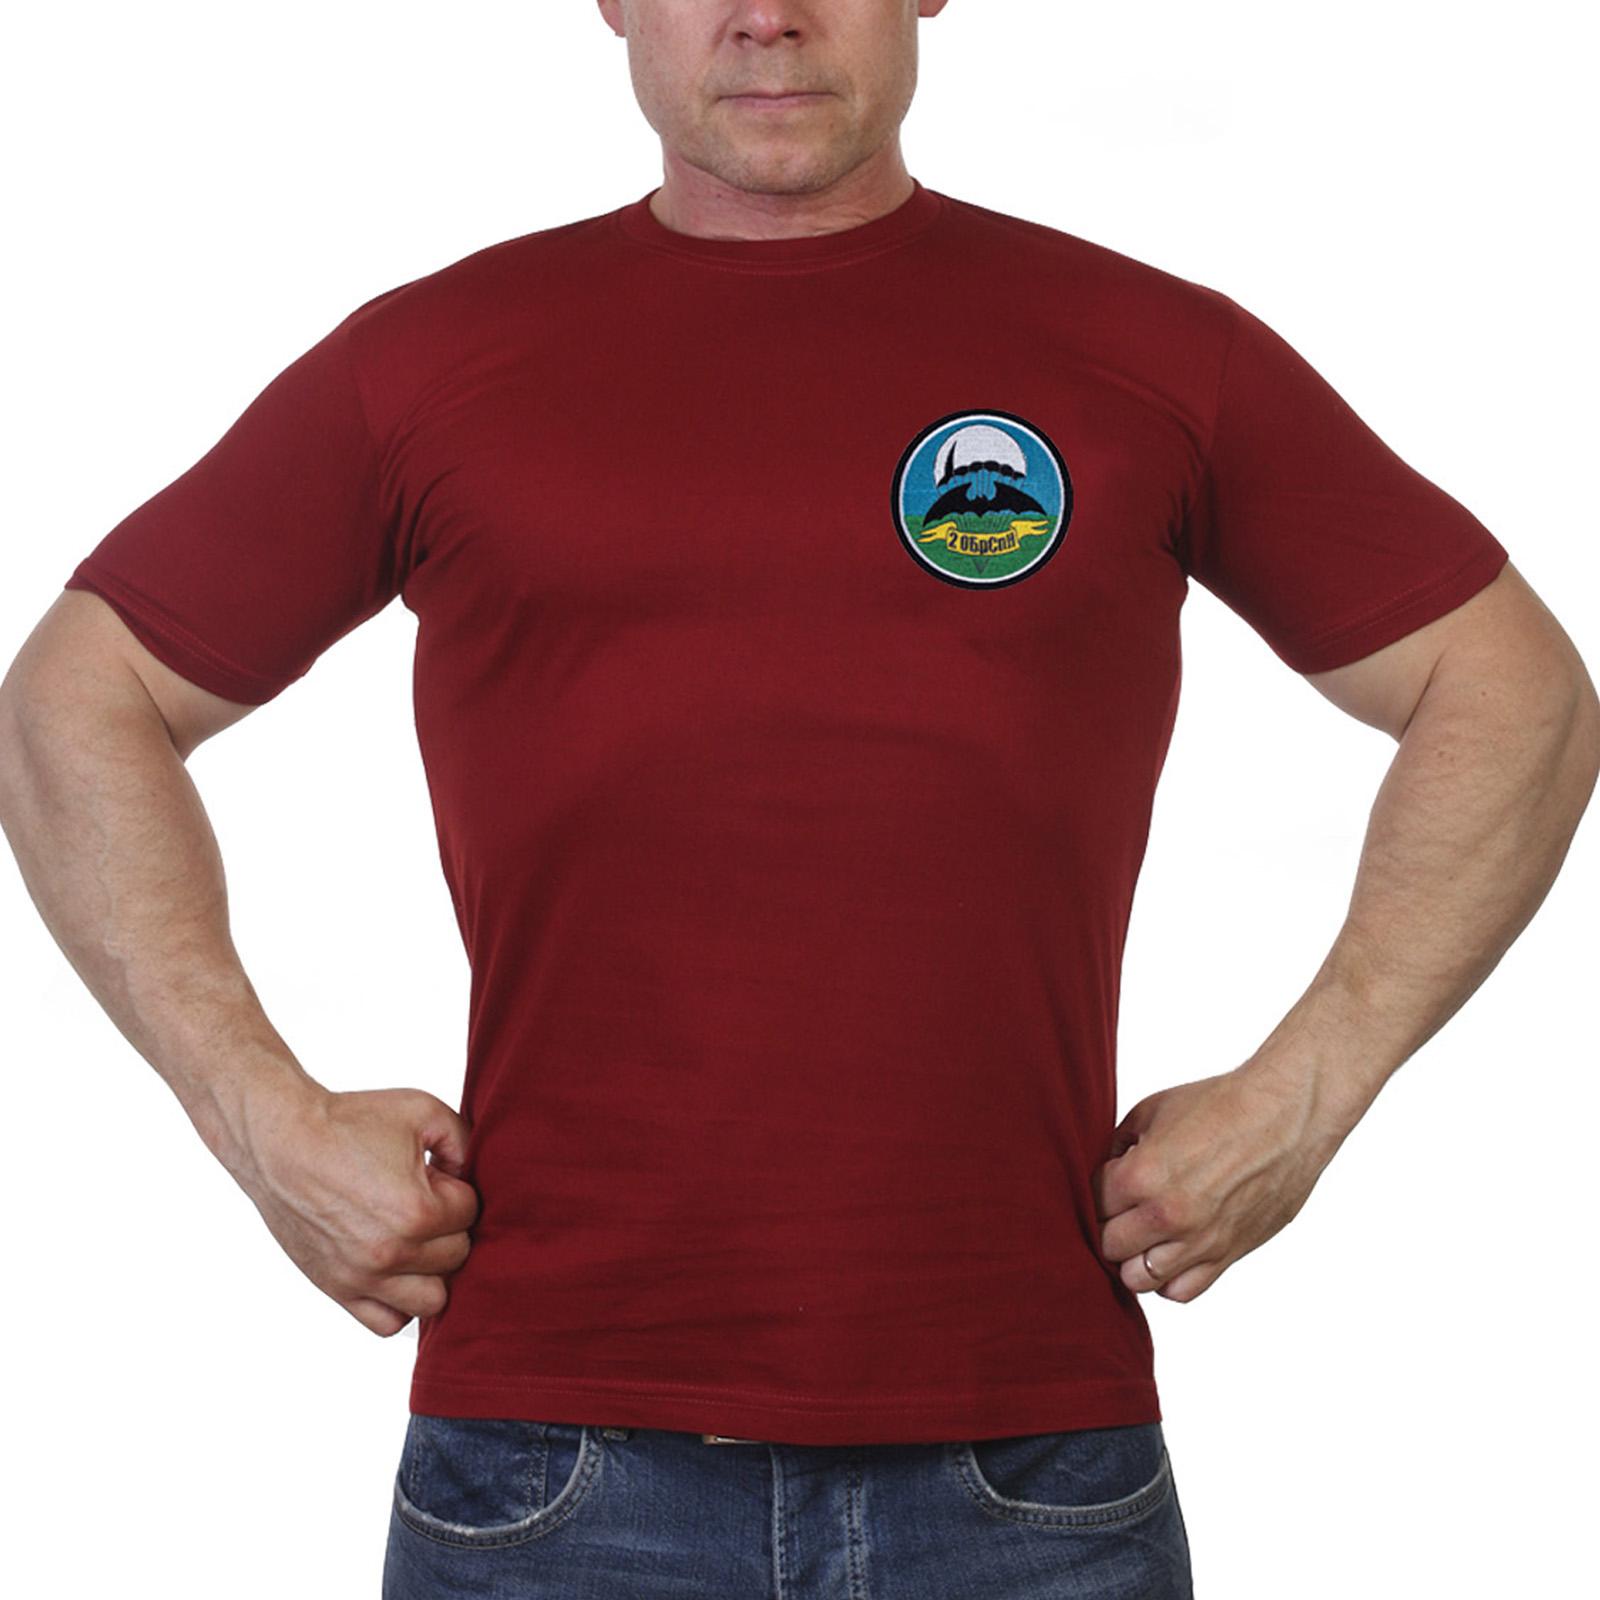 Мужская футболка 2 ОБрСпН